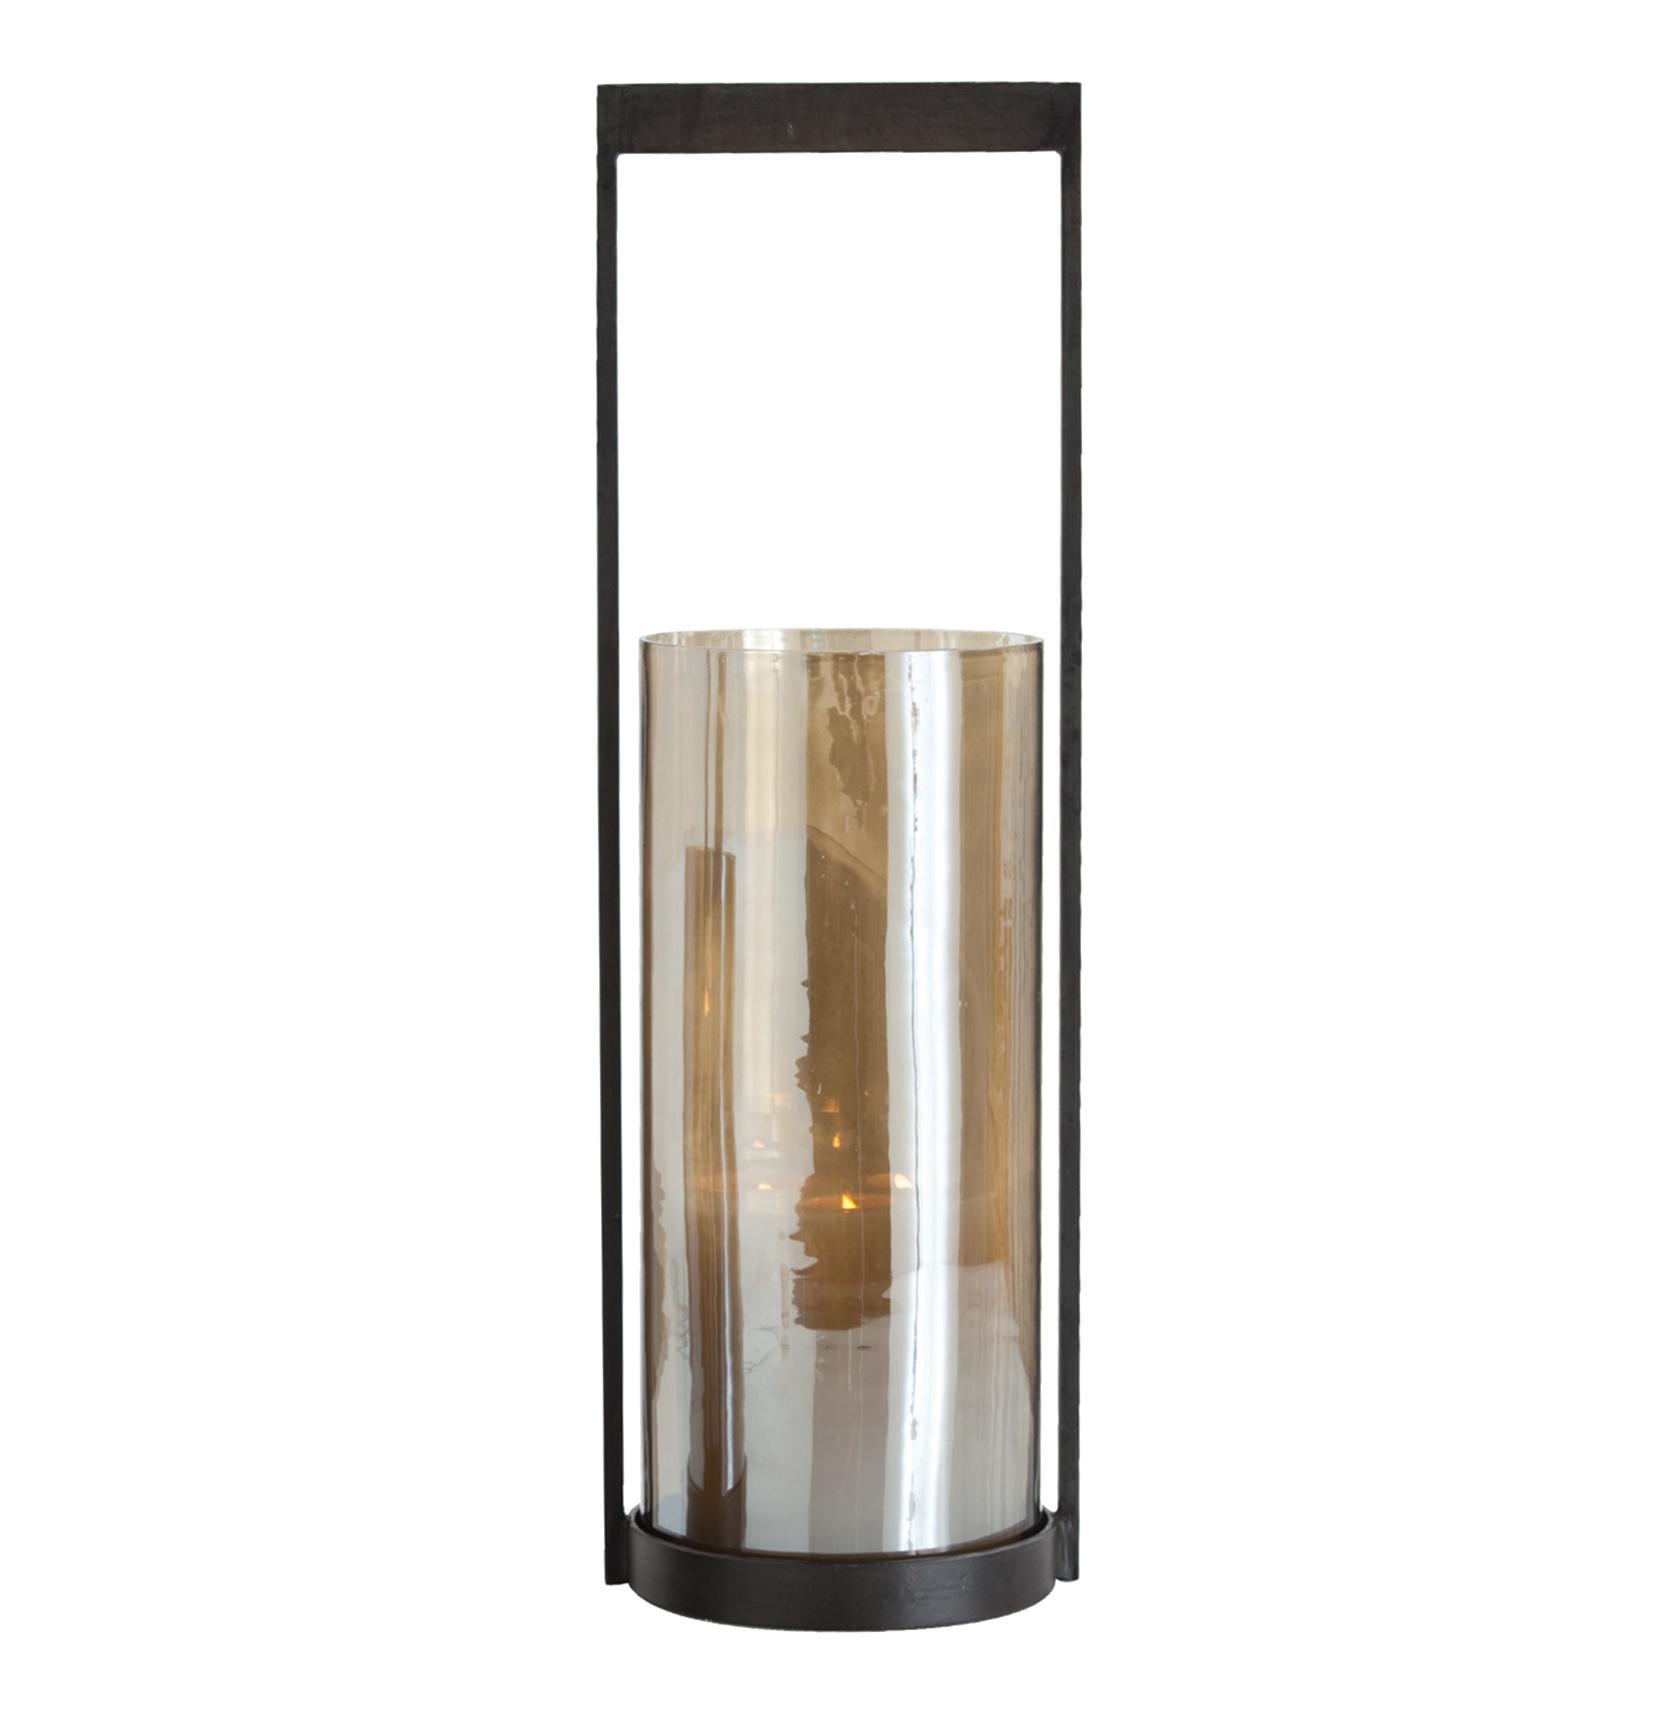 Egan Modern Mercury Glass Iron Hurricane Candle Holder - 20.5 Inch